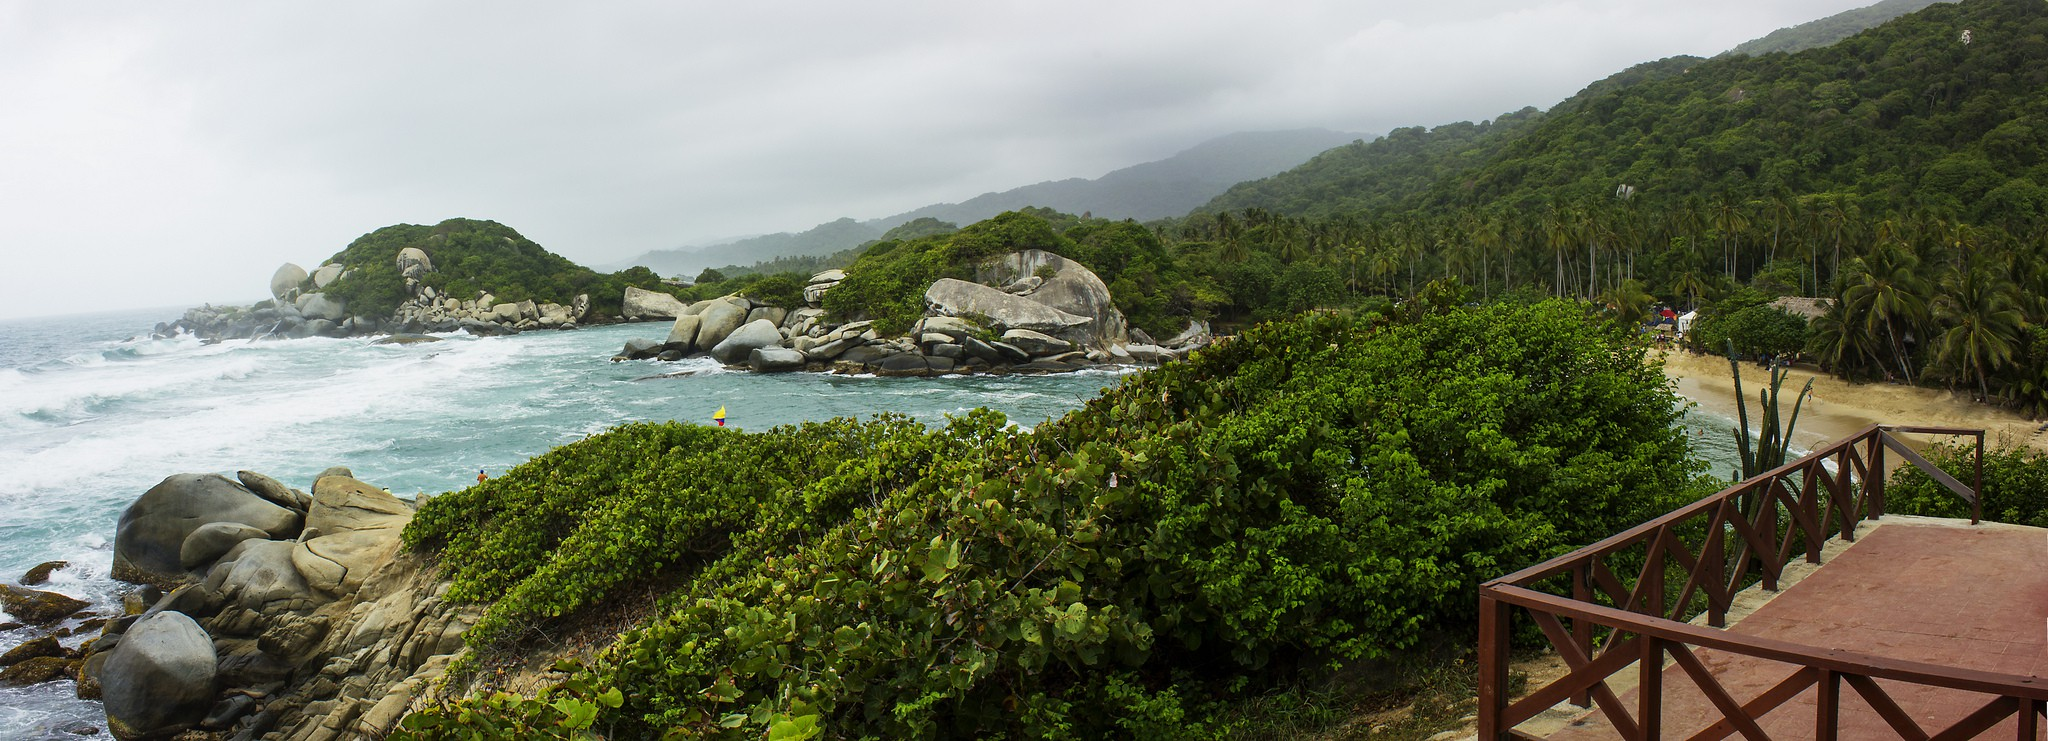 Colombia's Tayrona National Park | © Carlos Andres Reyes/Flickr